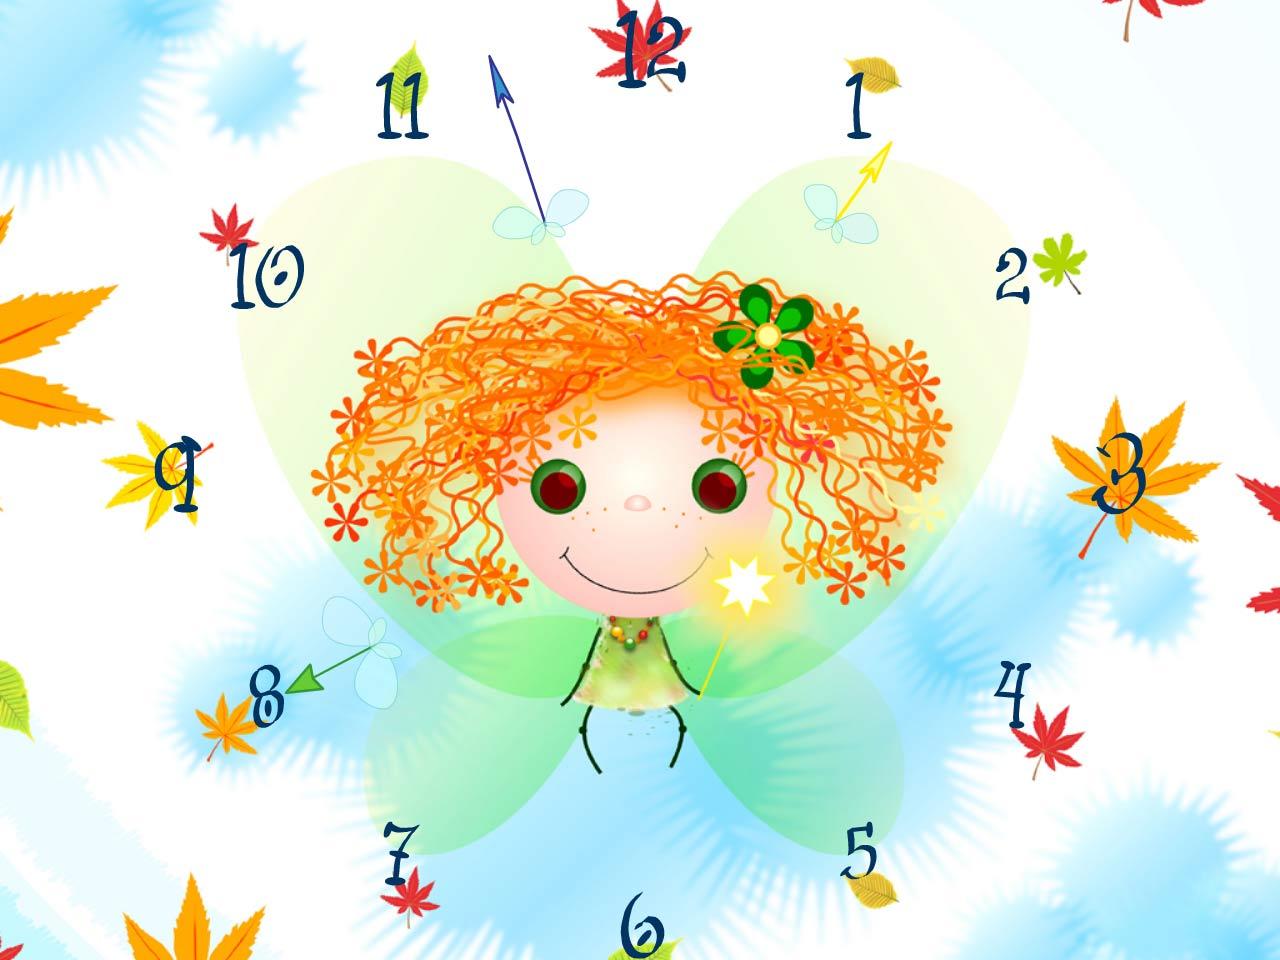 elf clock screensaver is a cute screensaver for those who love